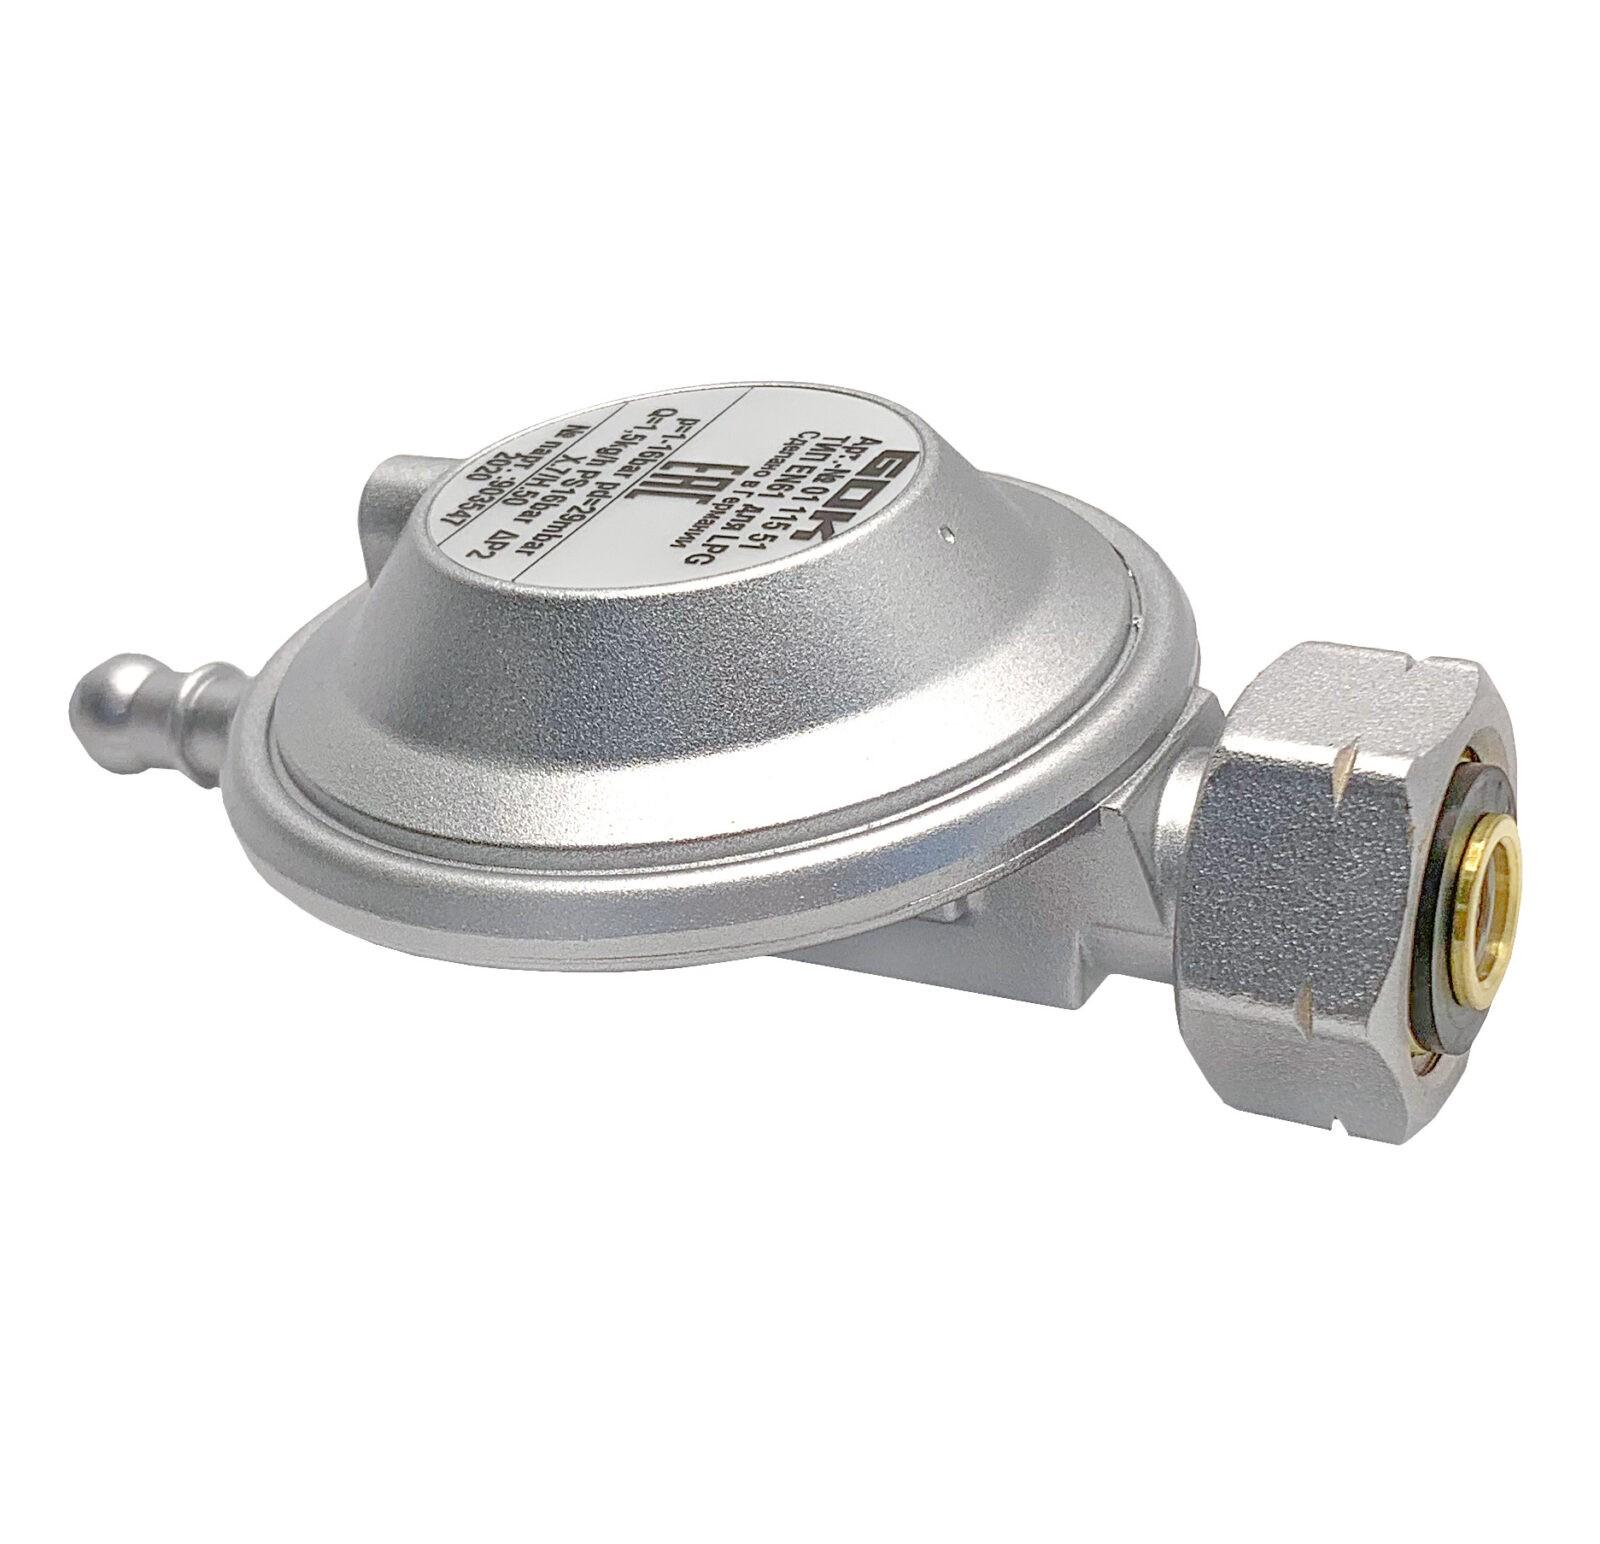 Регулятор давления газа GOK 29мбар 1,5 кг/час Shell x наконечник Ø8 мм под хомут